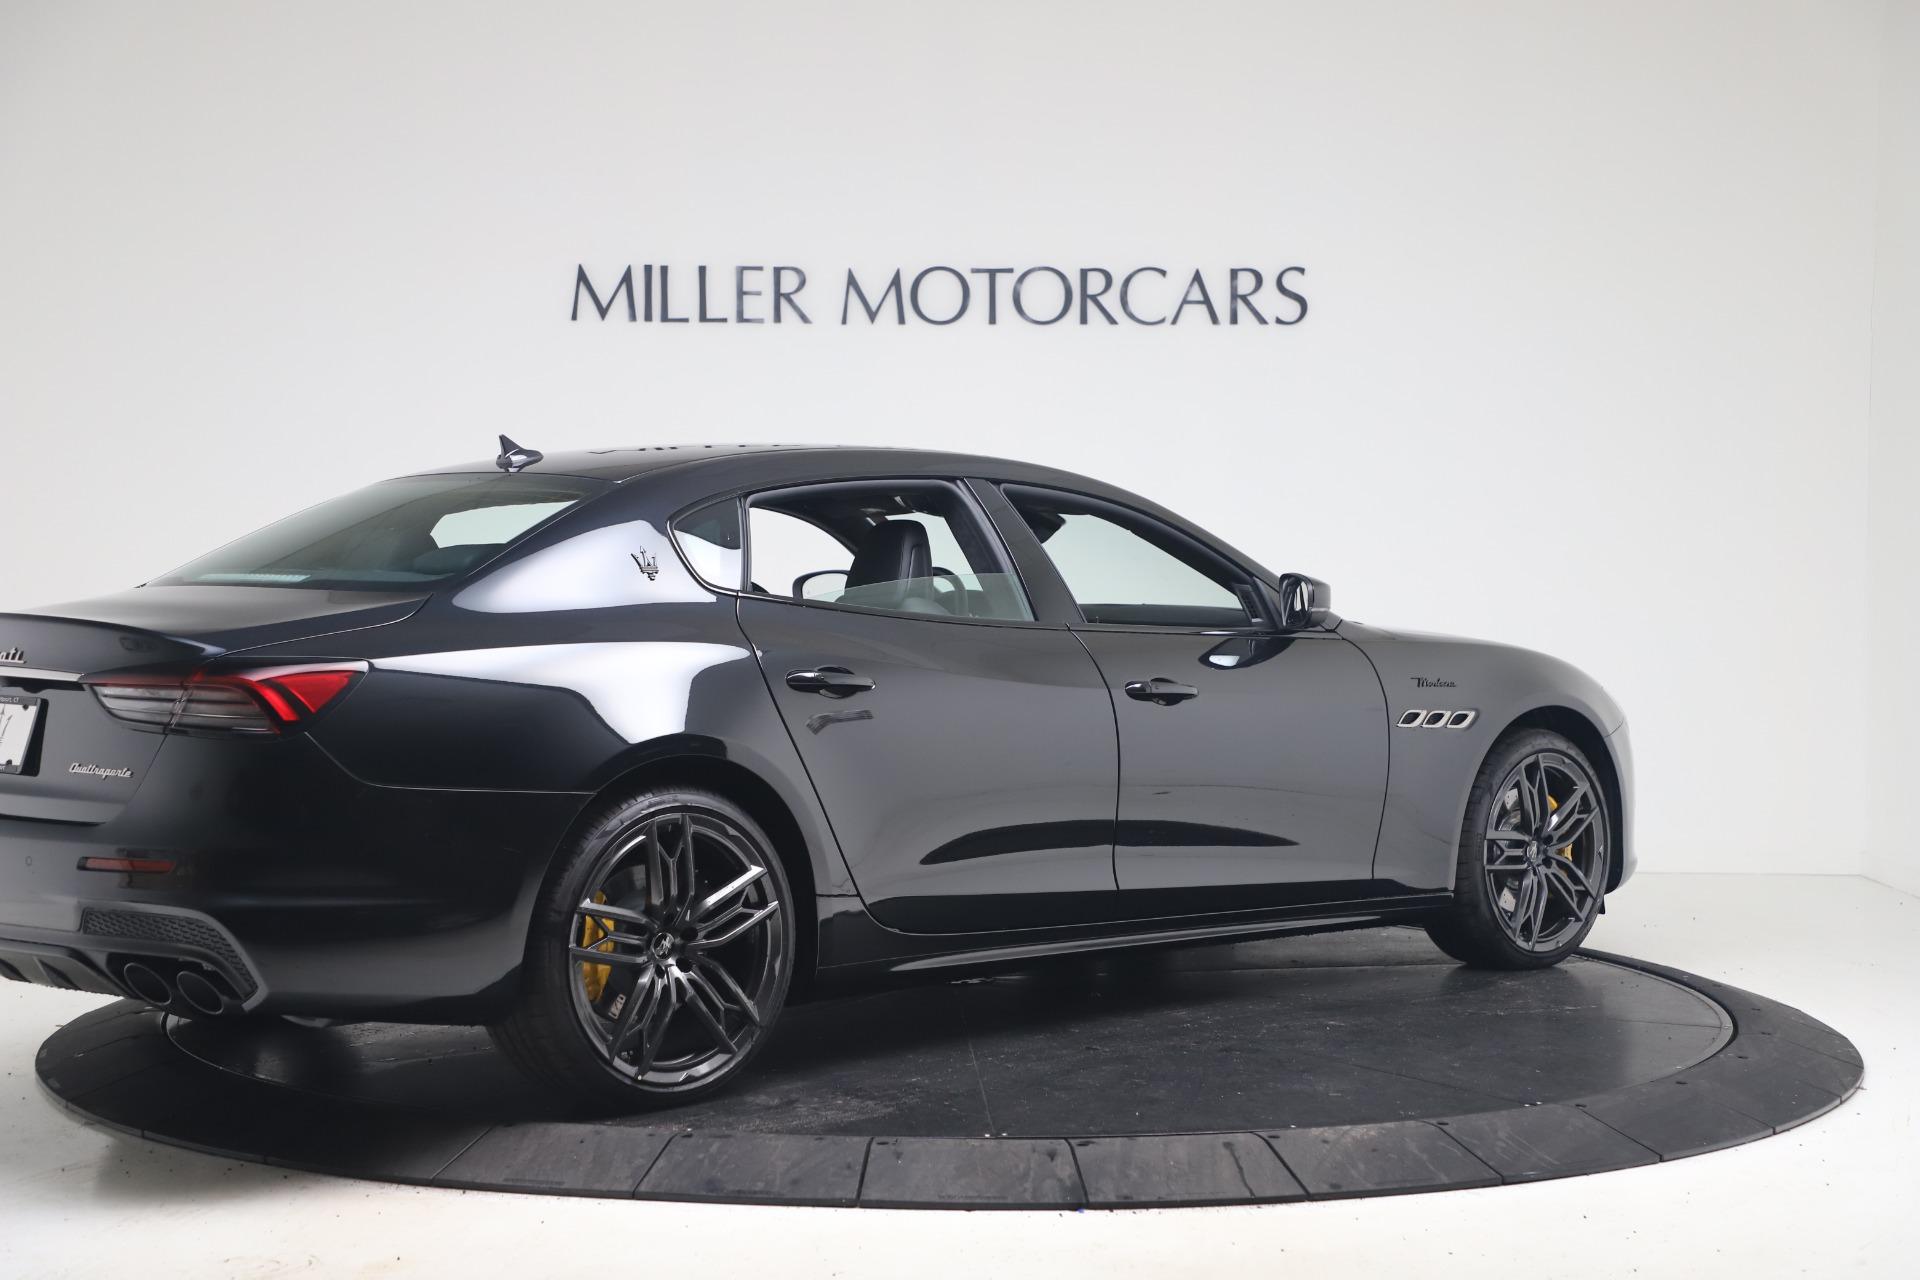 New 2022 Maserati Quattroporte Modena Q4